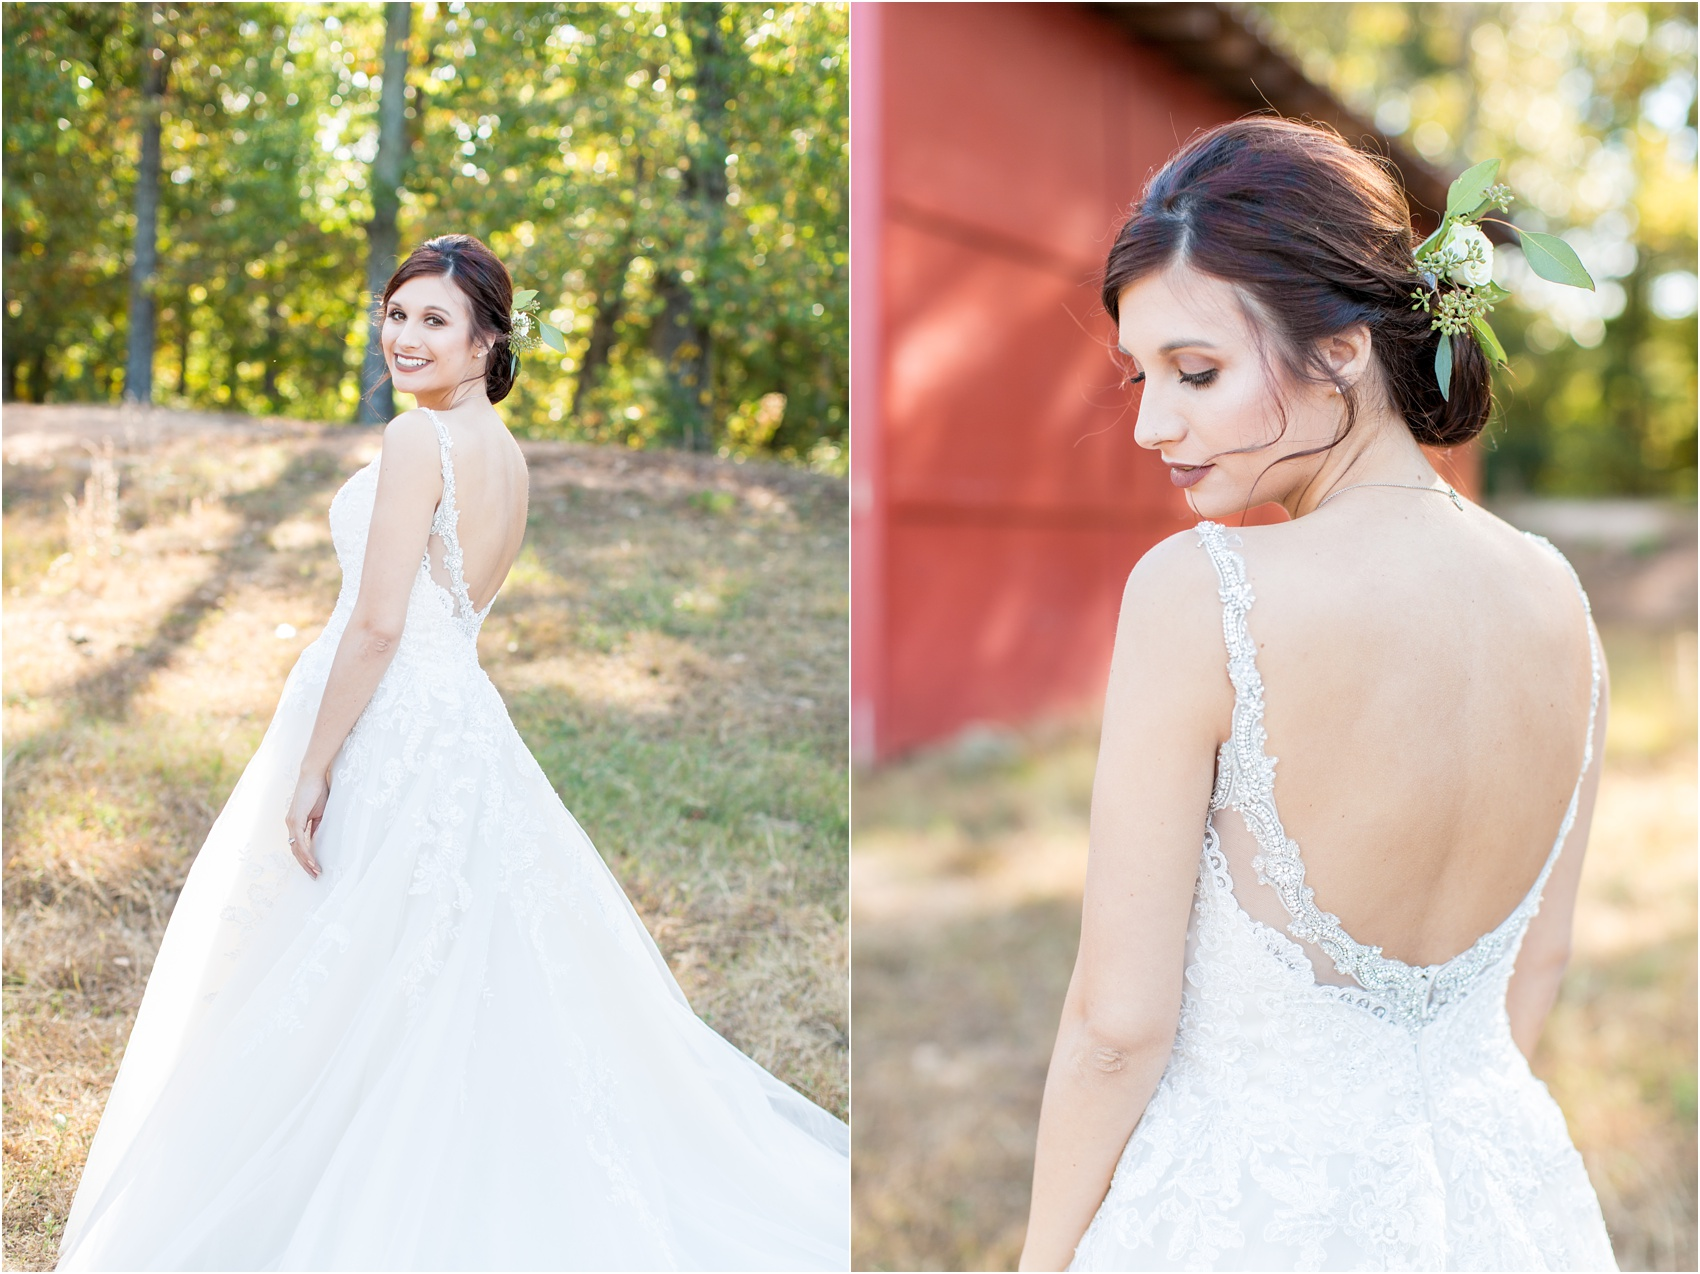 Savannah Eve Photography- May Wedding- Blog-42.jpg